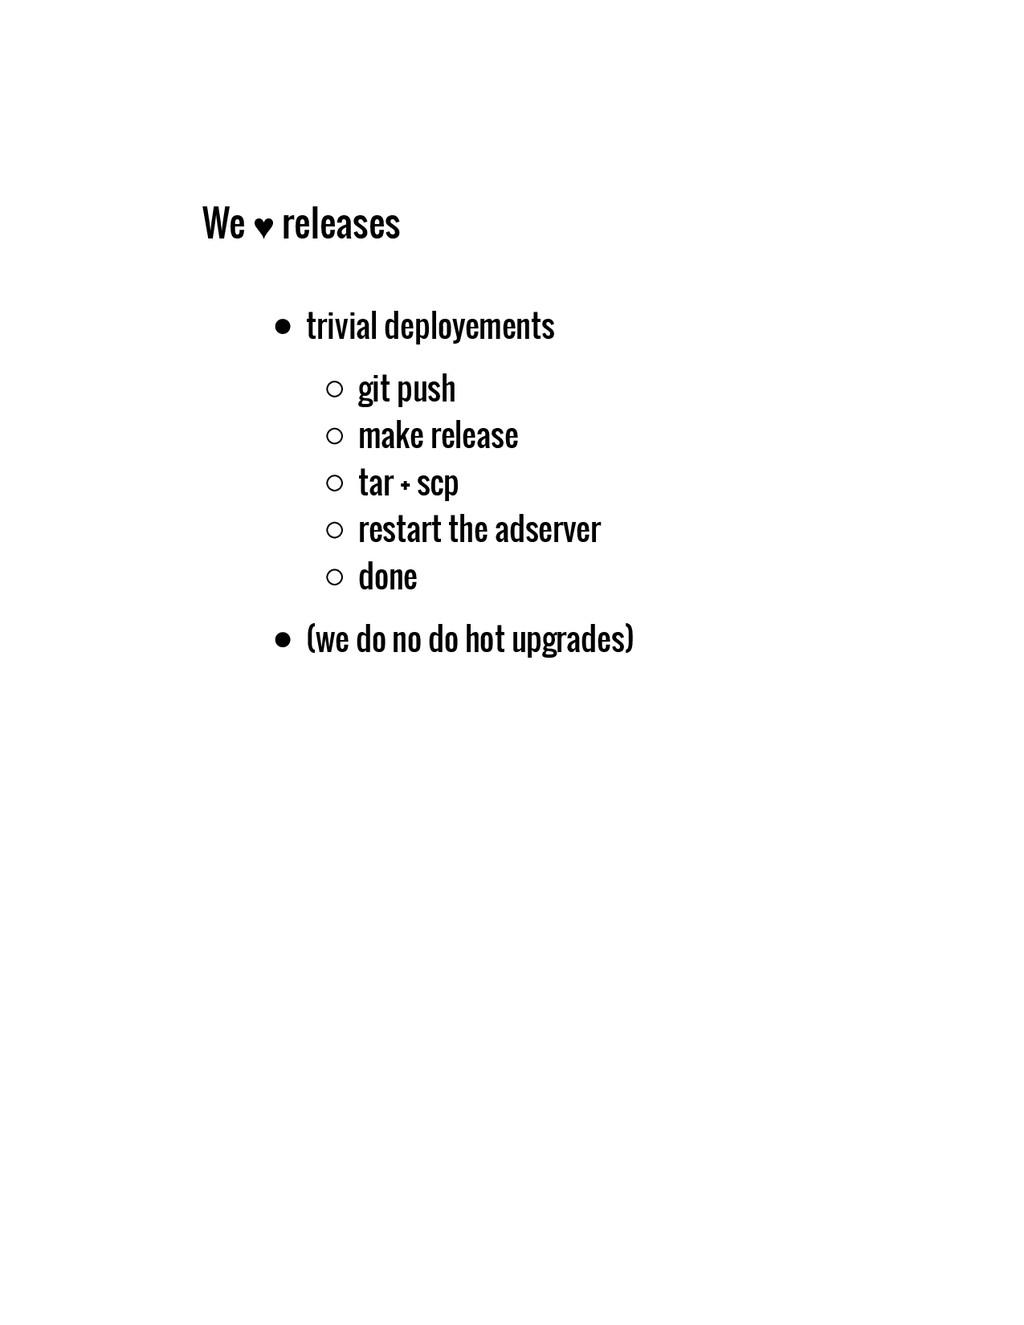 We ♥ releases trivial deployements git push mak...